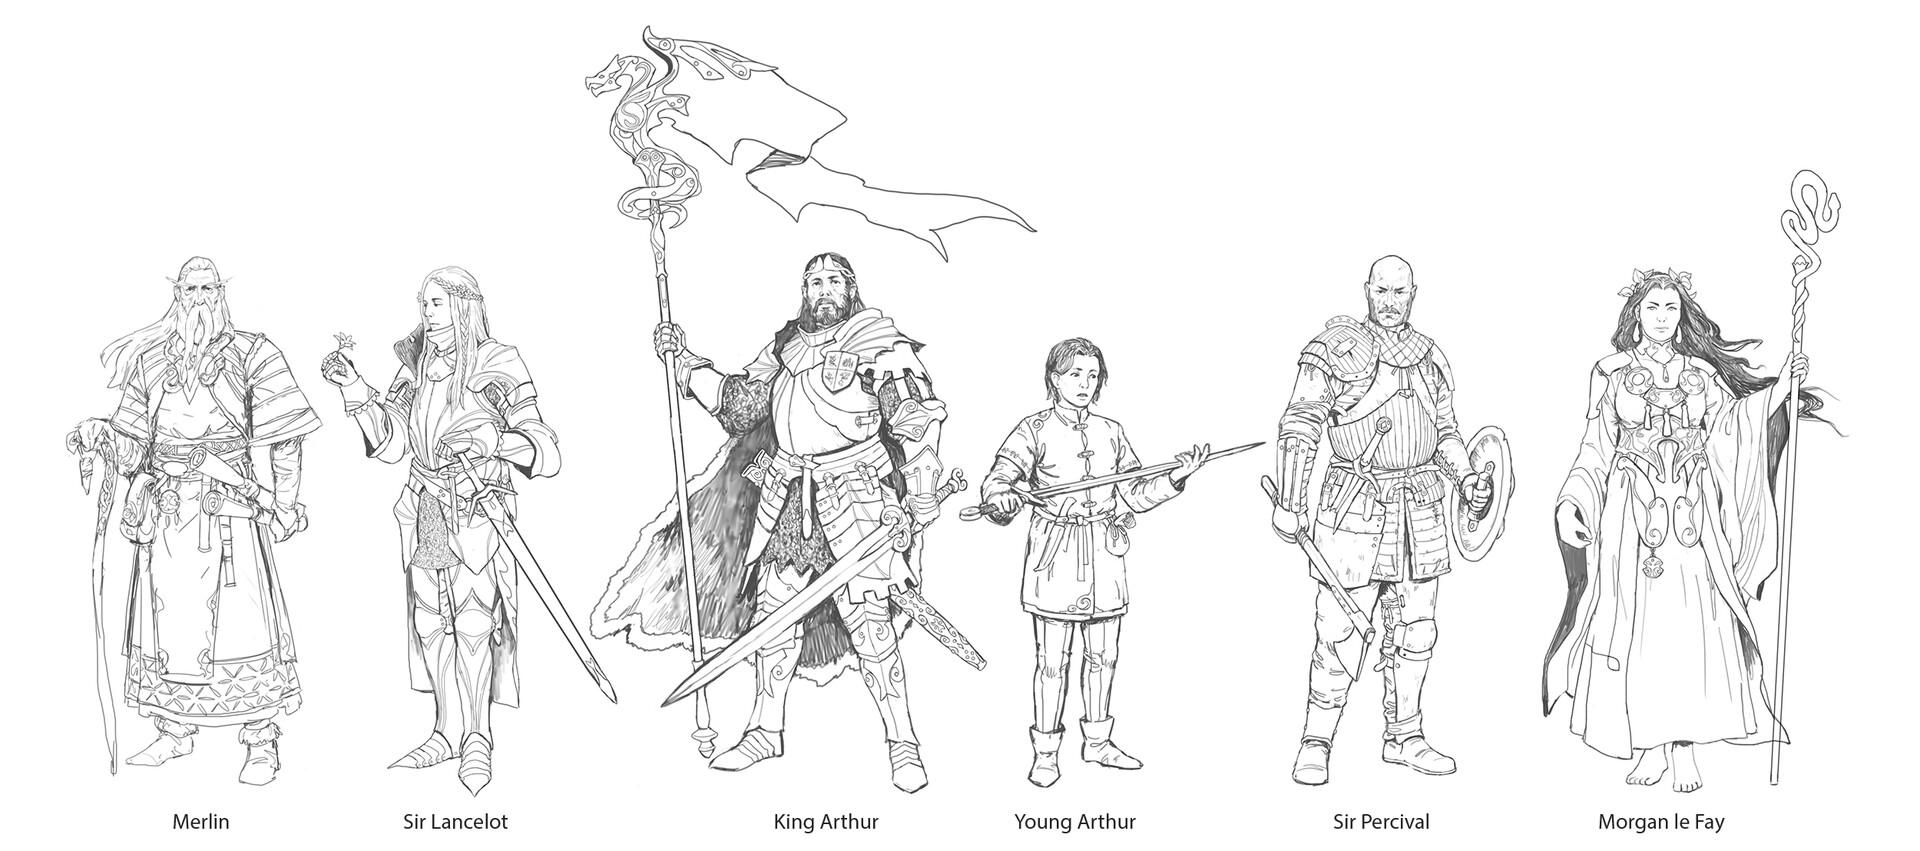 Veli nystrom artstation king arthur characters lines1